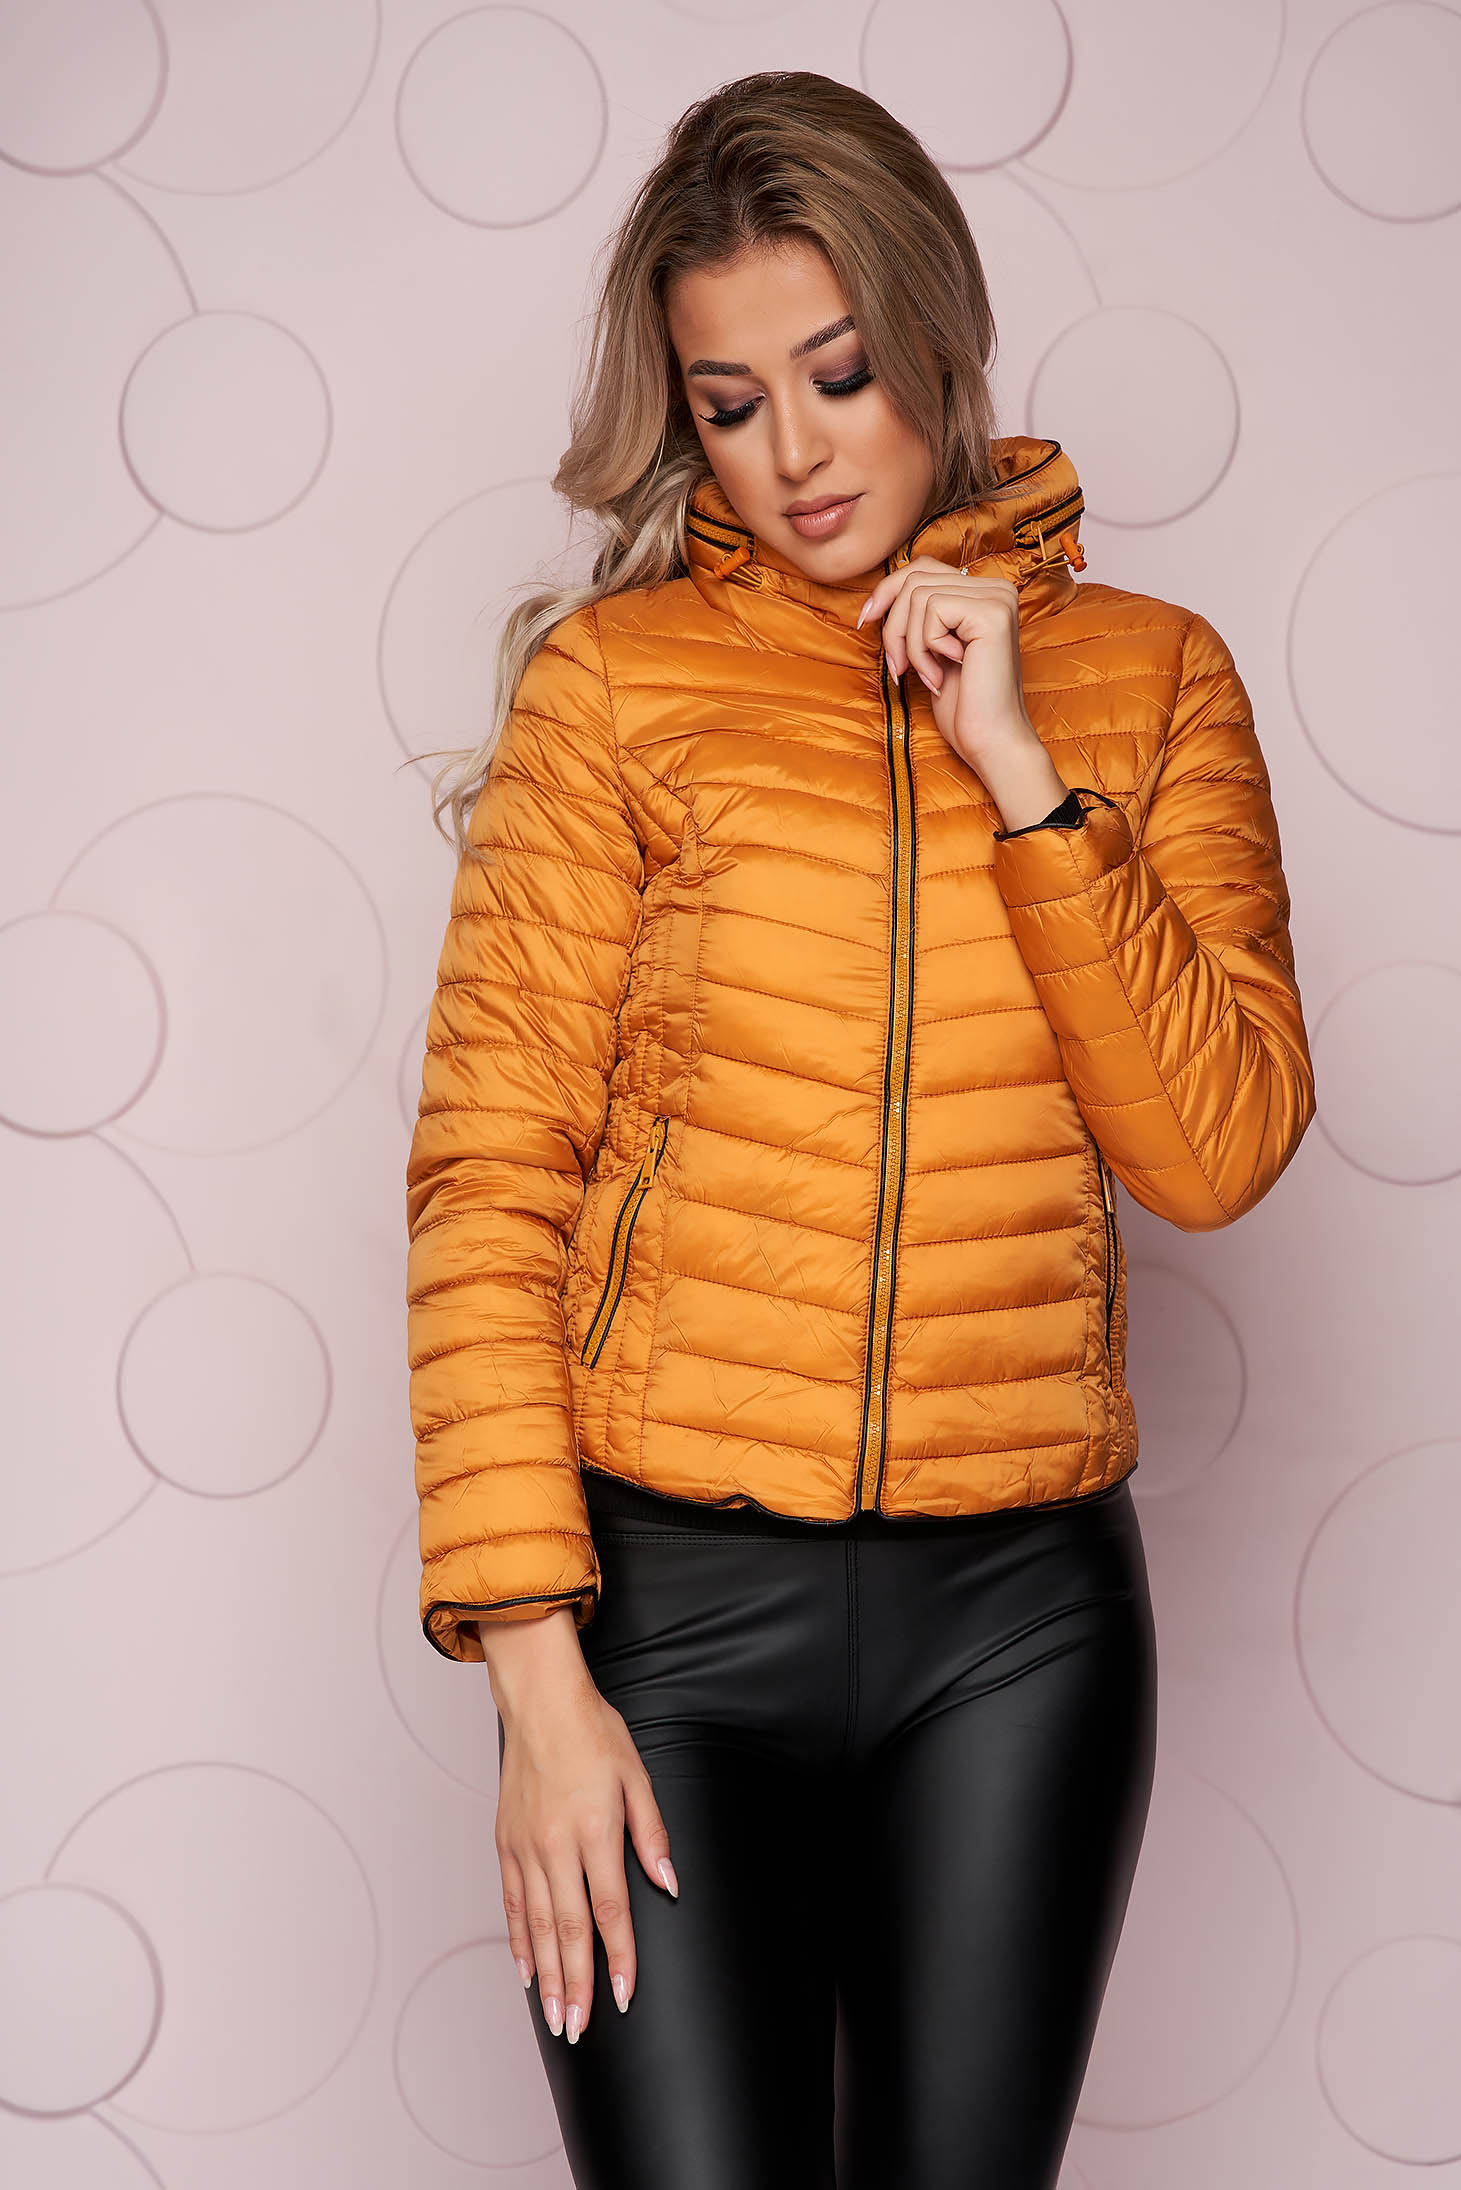 Mustard jacket tented short cut from slicker with zipper details pockets